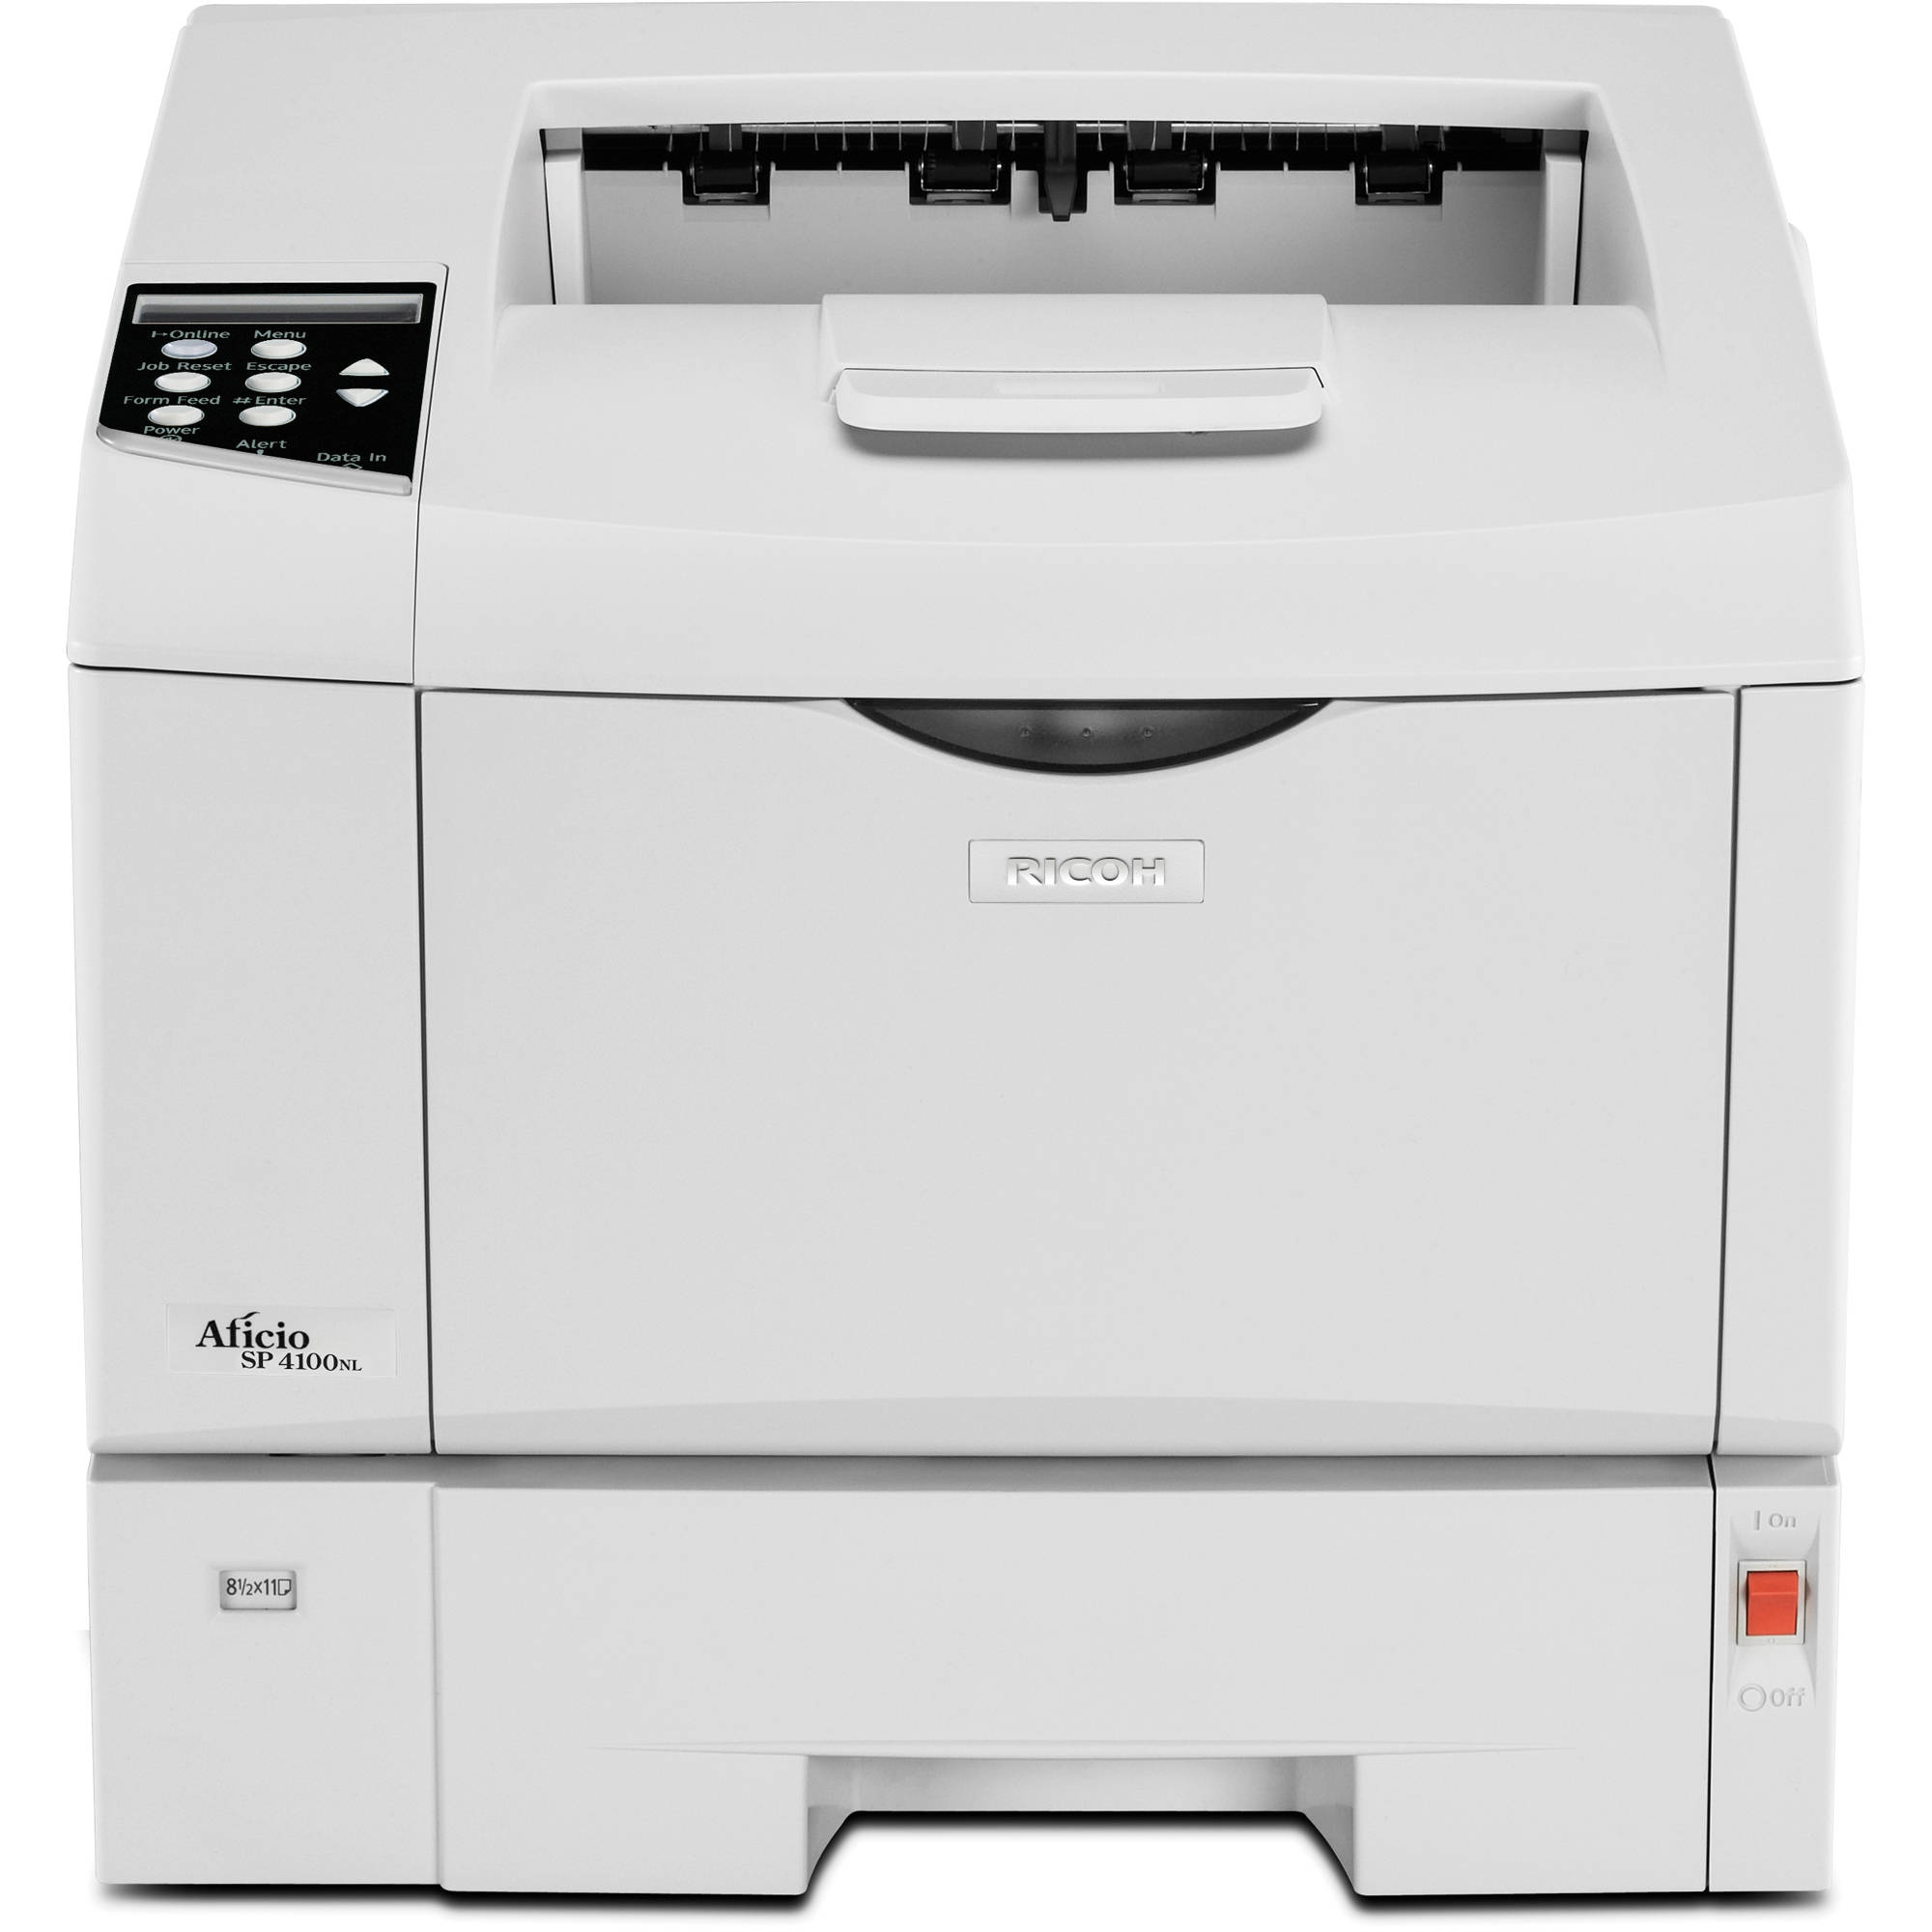 Ricoh Aficio SP 4100N Printer Universal PostScript3 Treiber Windows 10